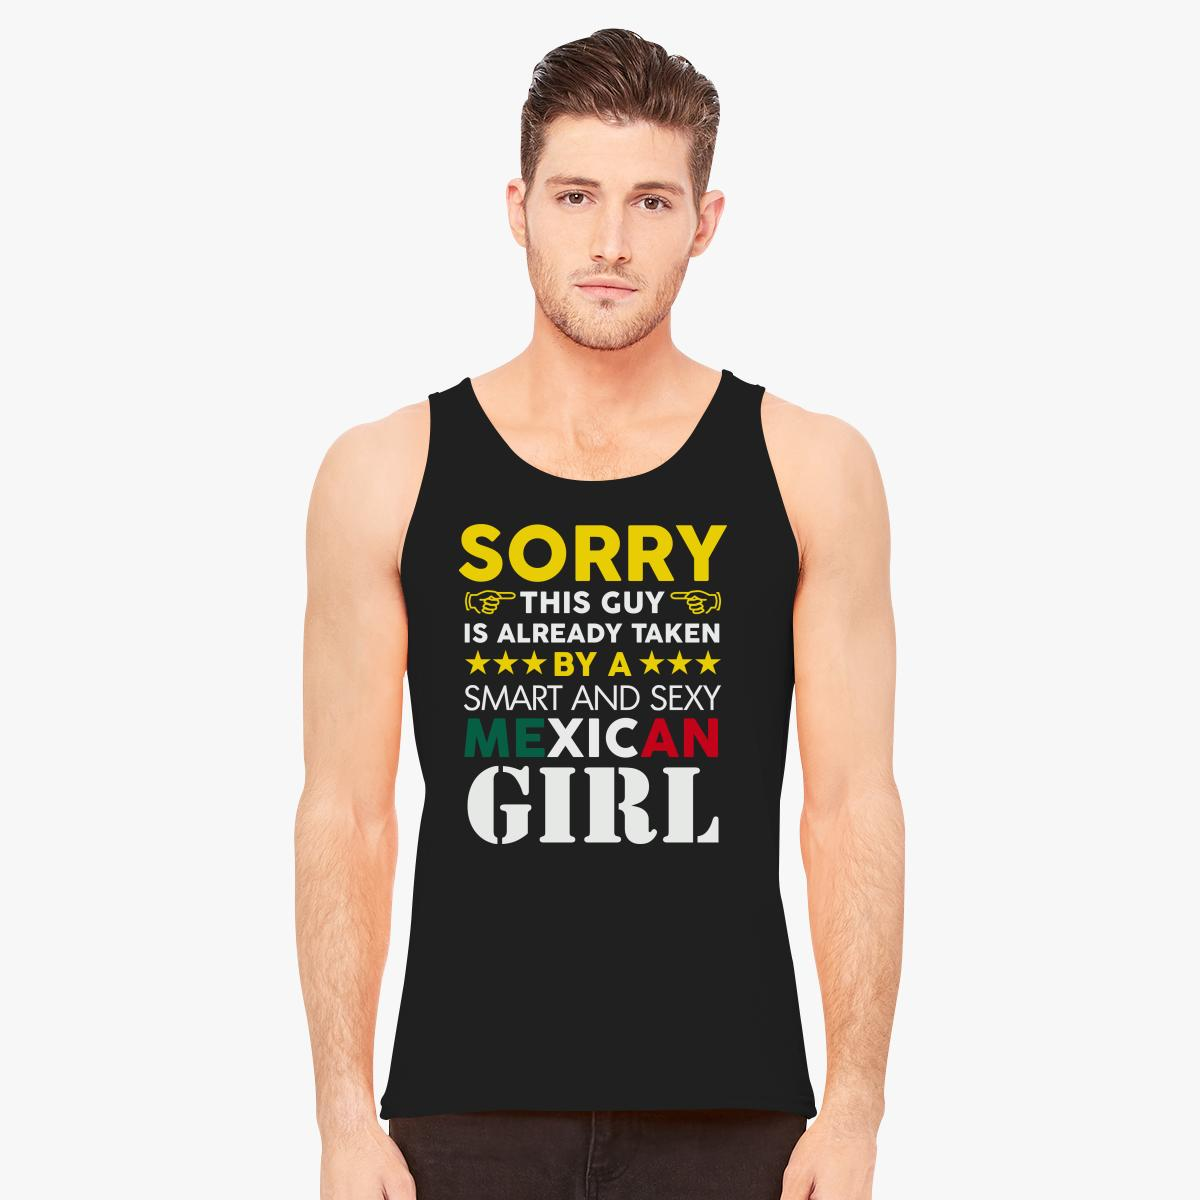 bb83a87d5 Girl Muscle Shirts | RLDM